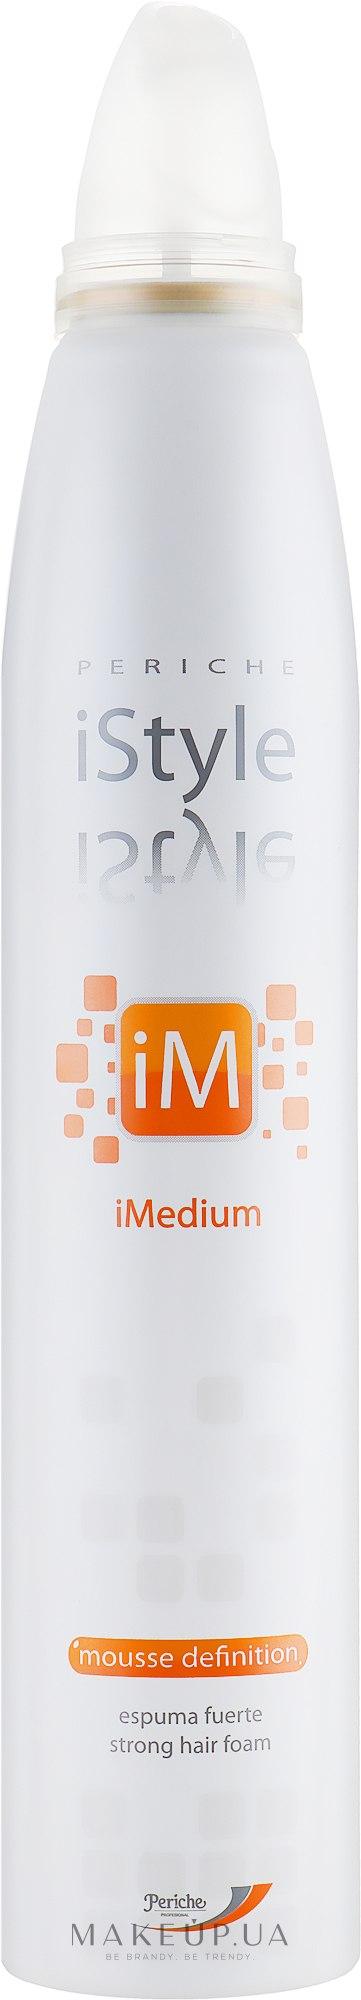 Мусс для укладки волос сильной фиксации - Periche Professional iStyle iMedium Mousse Definition — фото 300ml